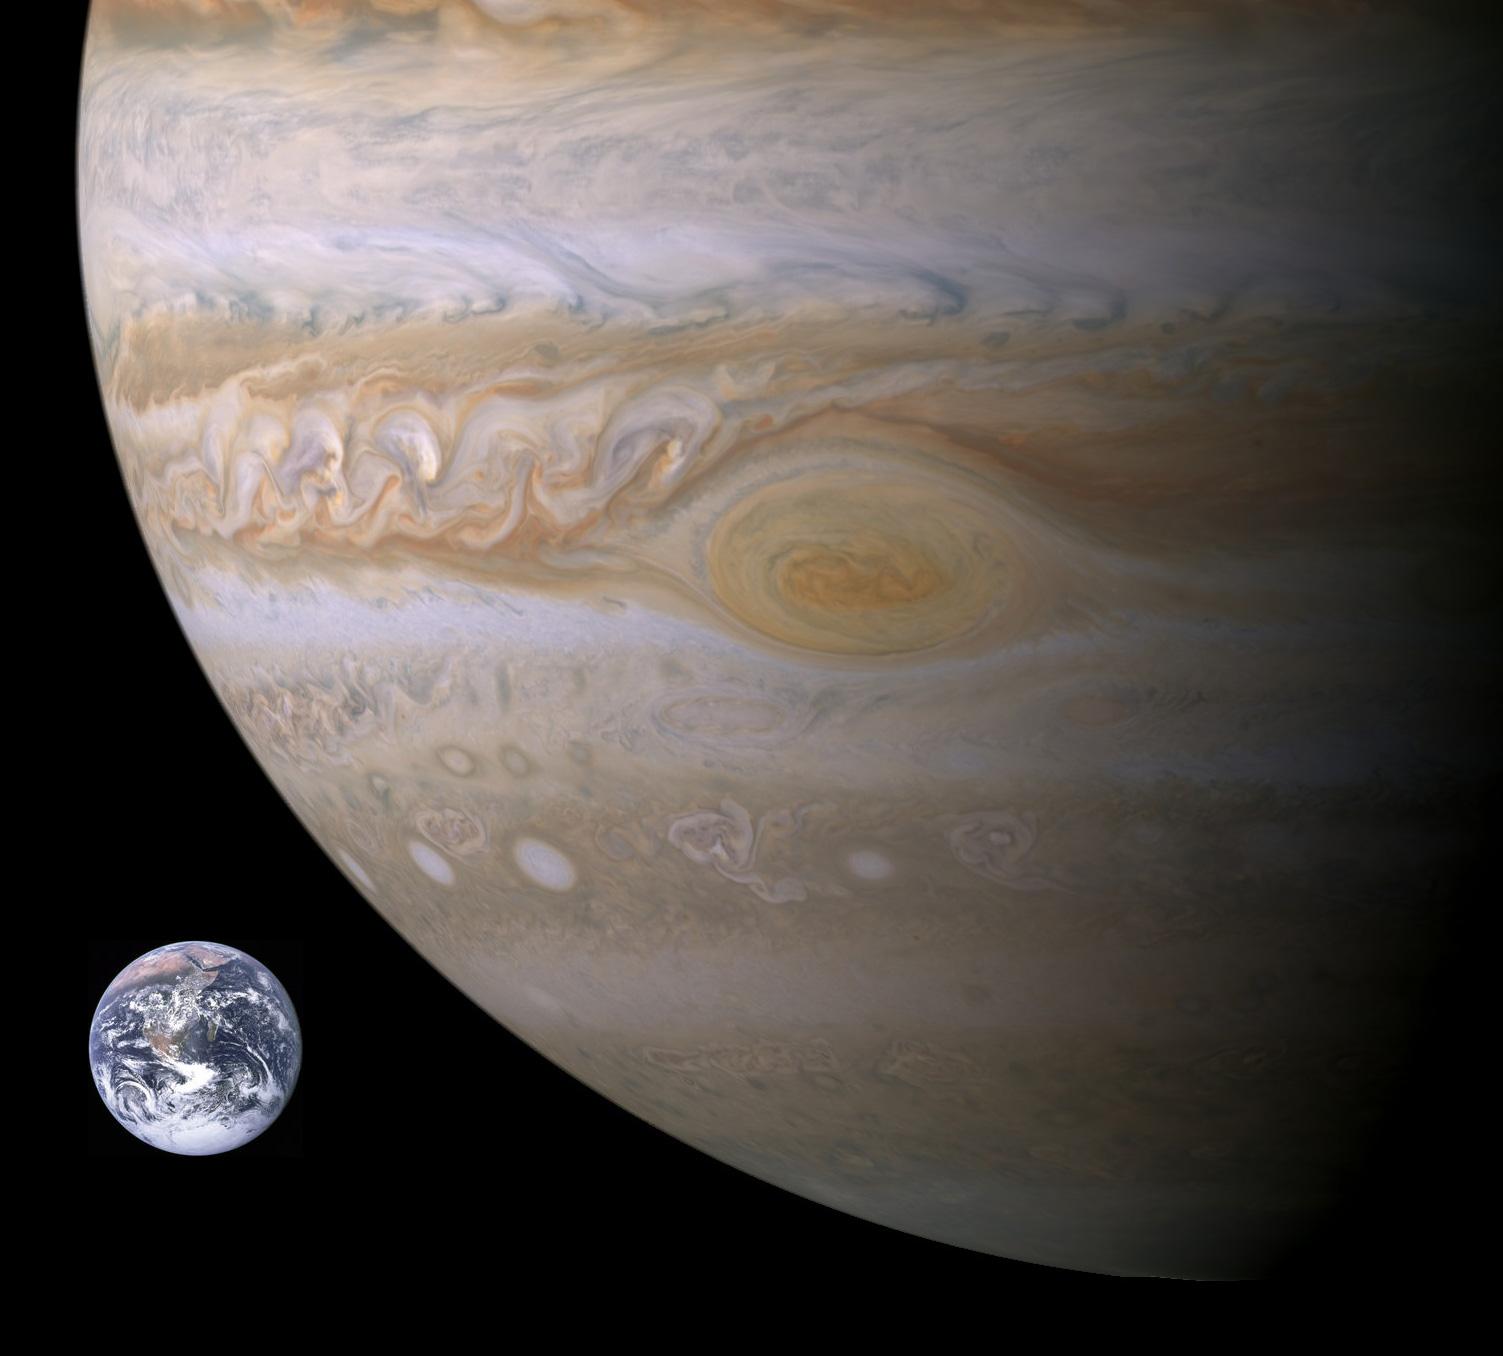 big jupiter moons - photo #35